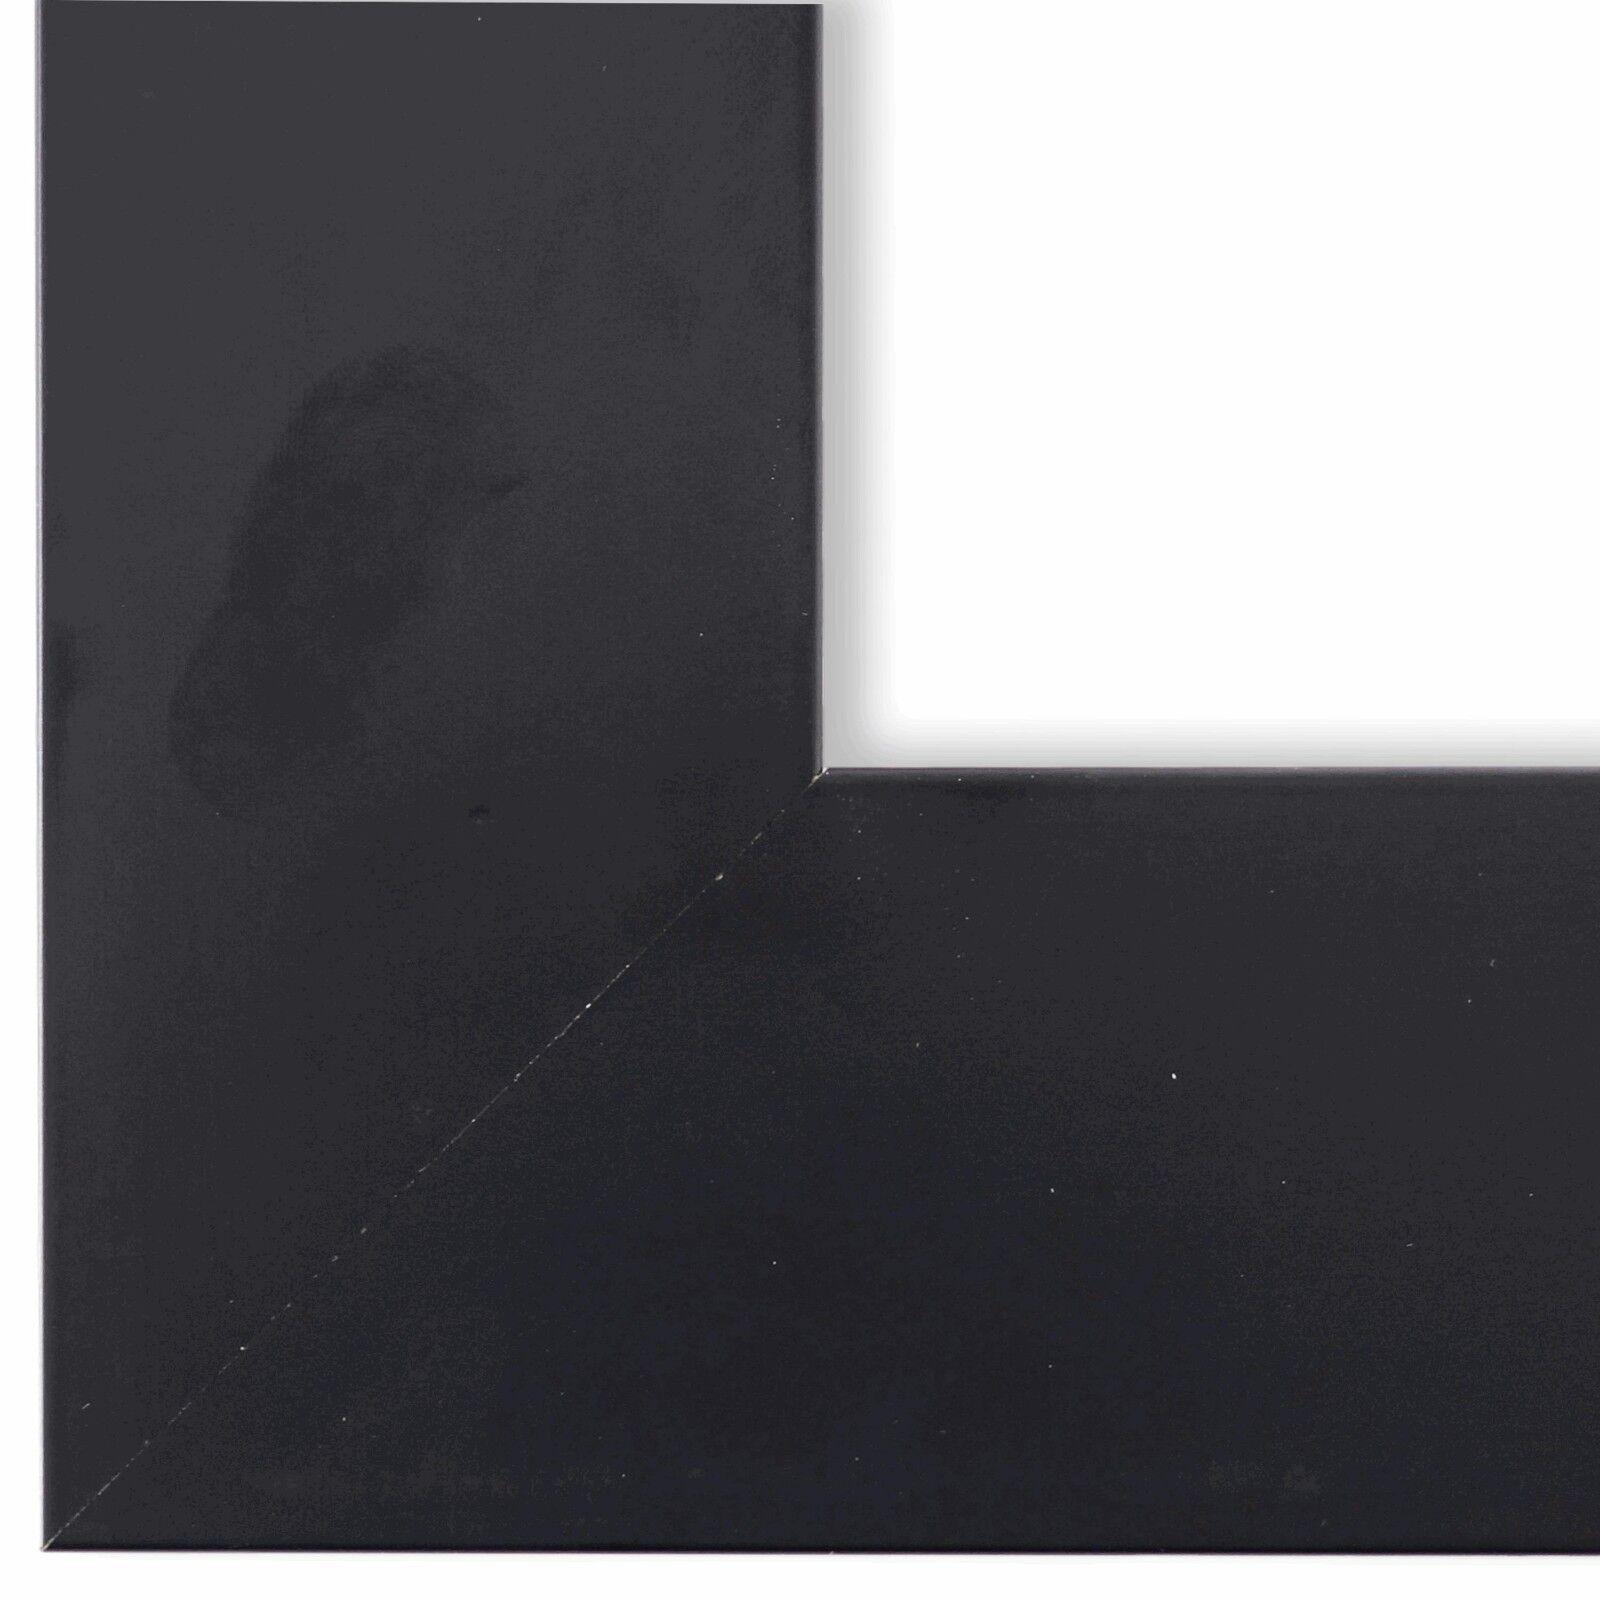 Bilderrahmen matt Schwarz Shabby Vintage Retro Holz Novara 7,0 - NEU alle Größen